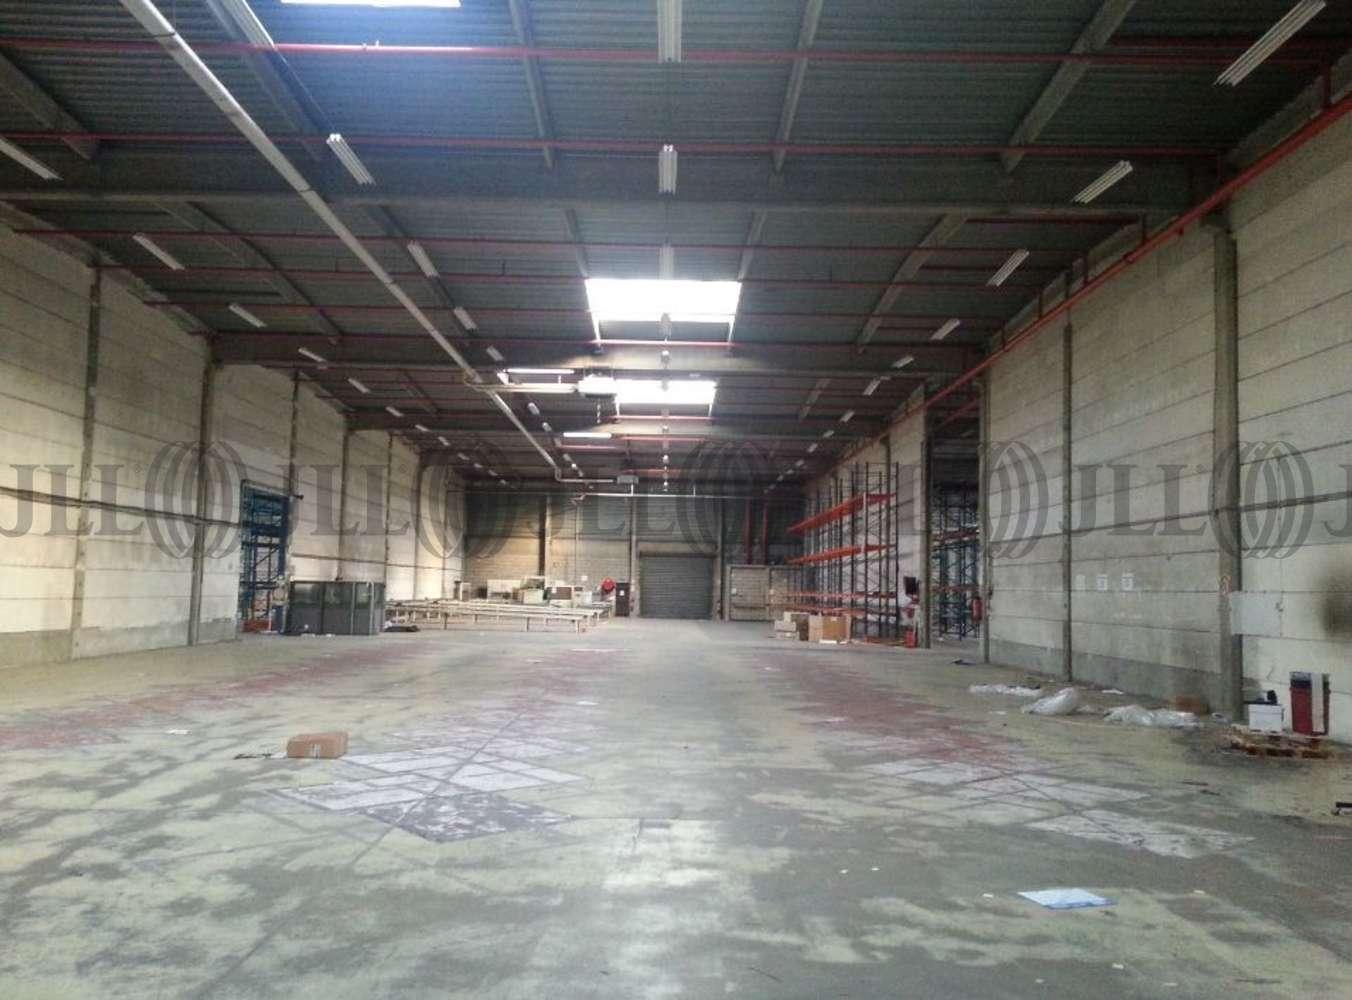 Activités/entrepôt Rosny sous bois, 93110